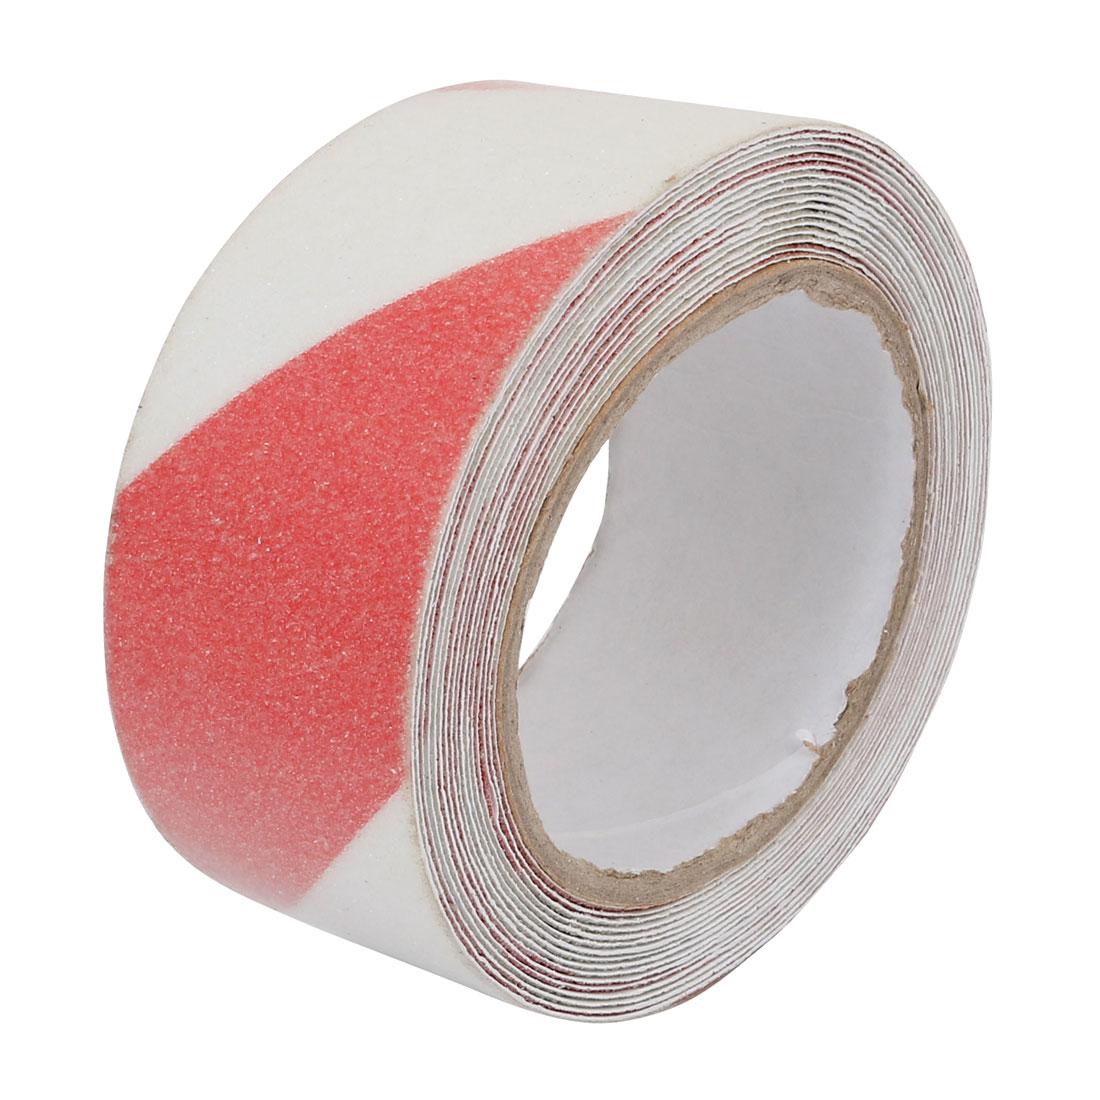 5M Long 5cm Width Adhesive Grit Anti Slip Tape for Stairs Floor Dark Red White